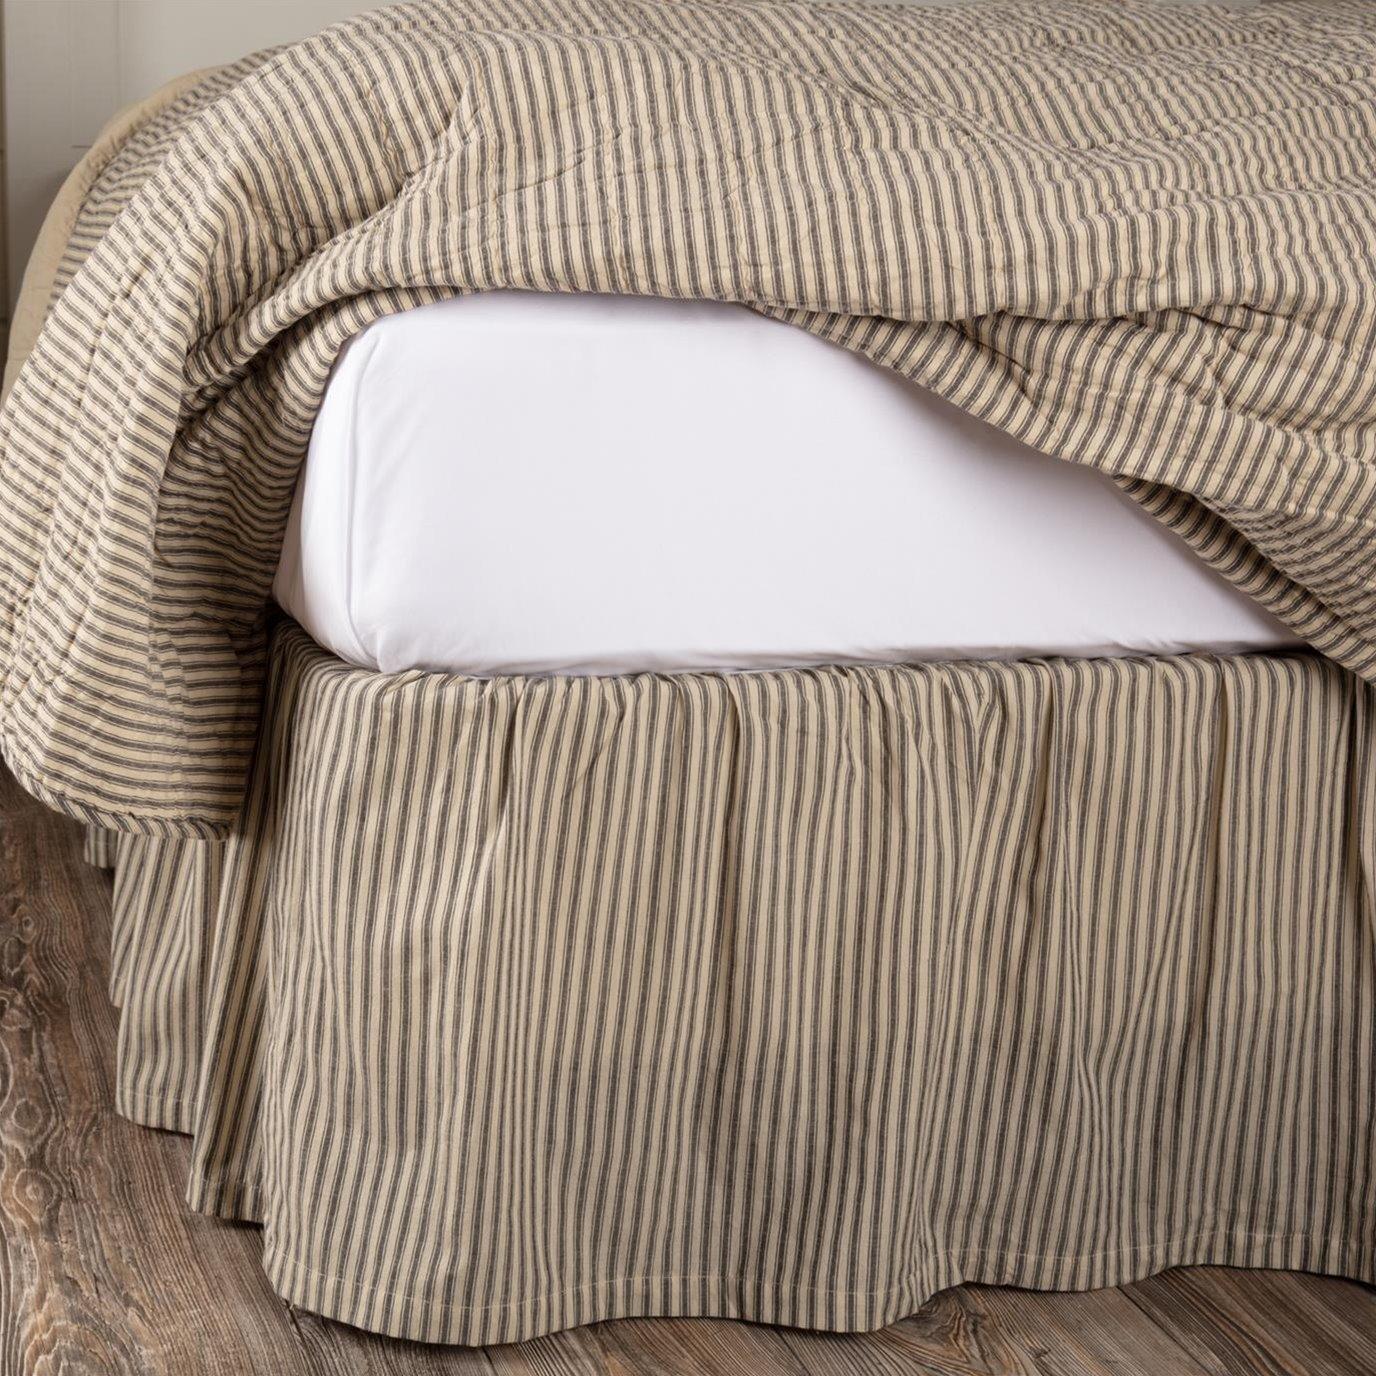 Sawyer Mill Charcoal Ticking Stripe Queen Bed Skirt 60x80x16